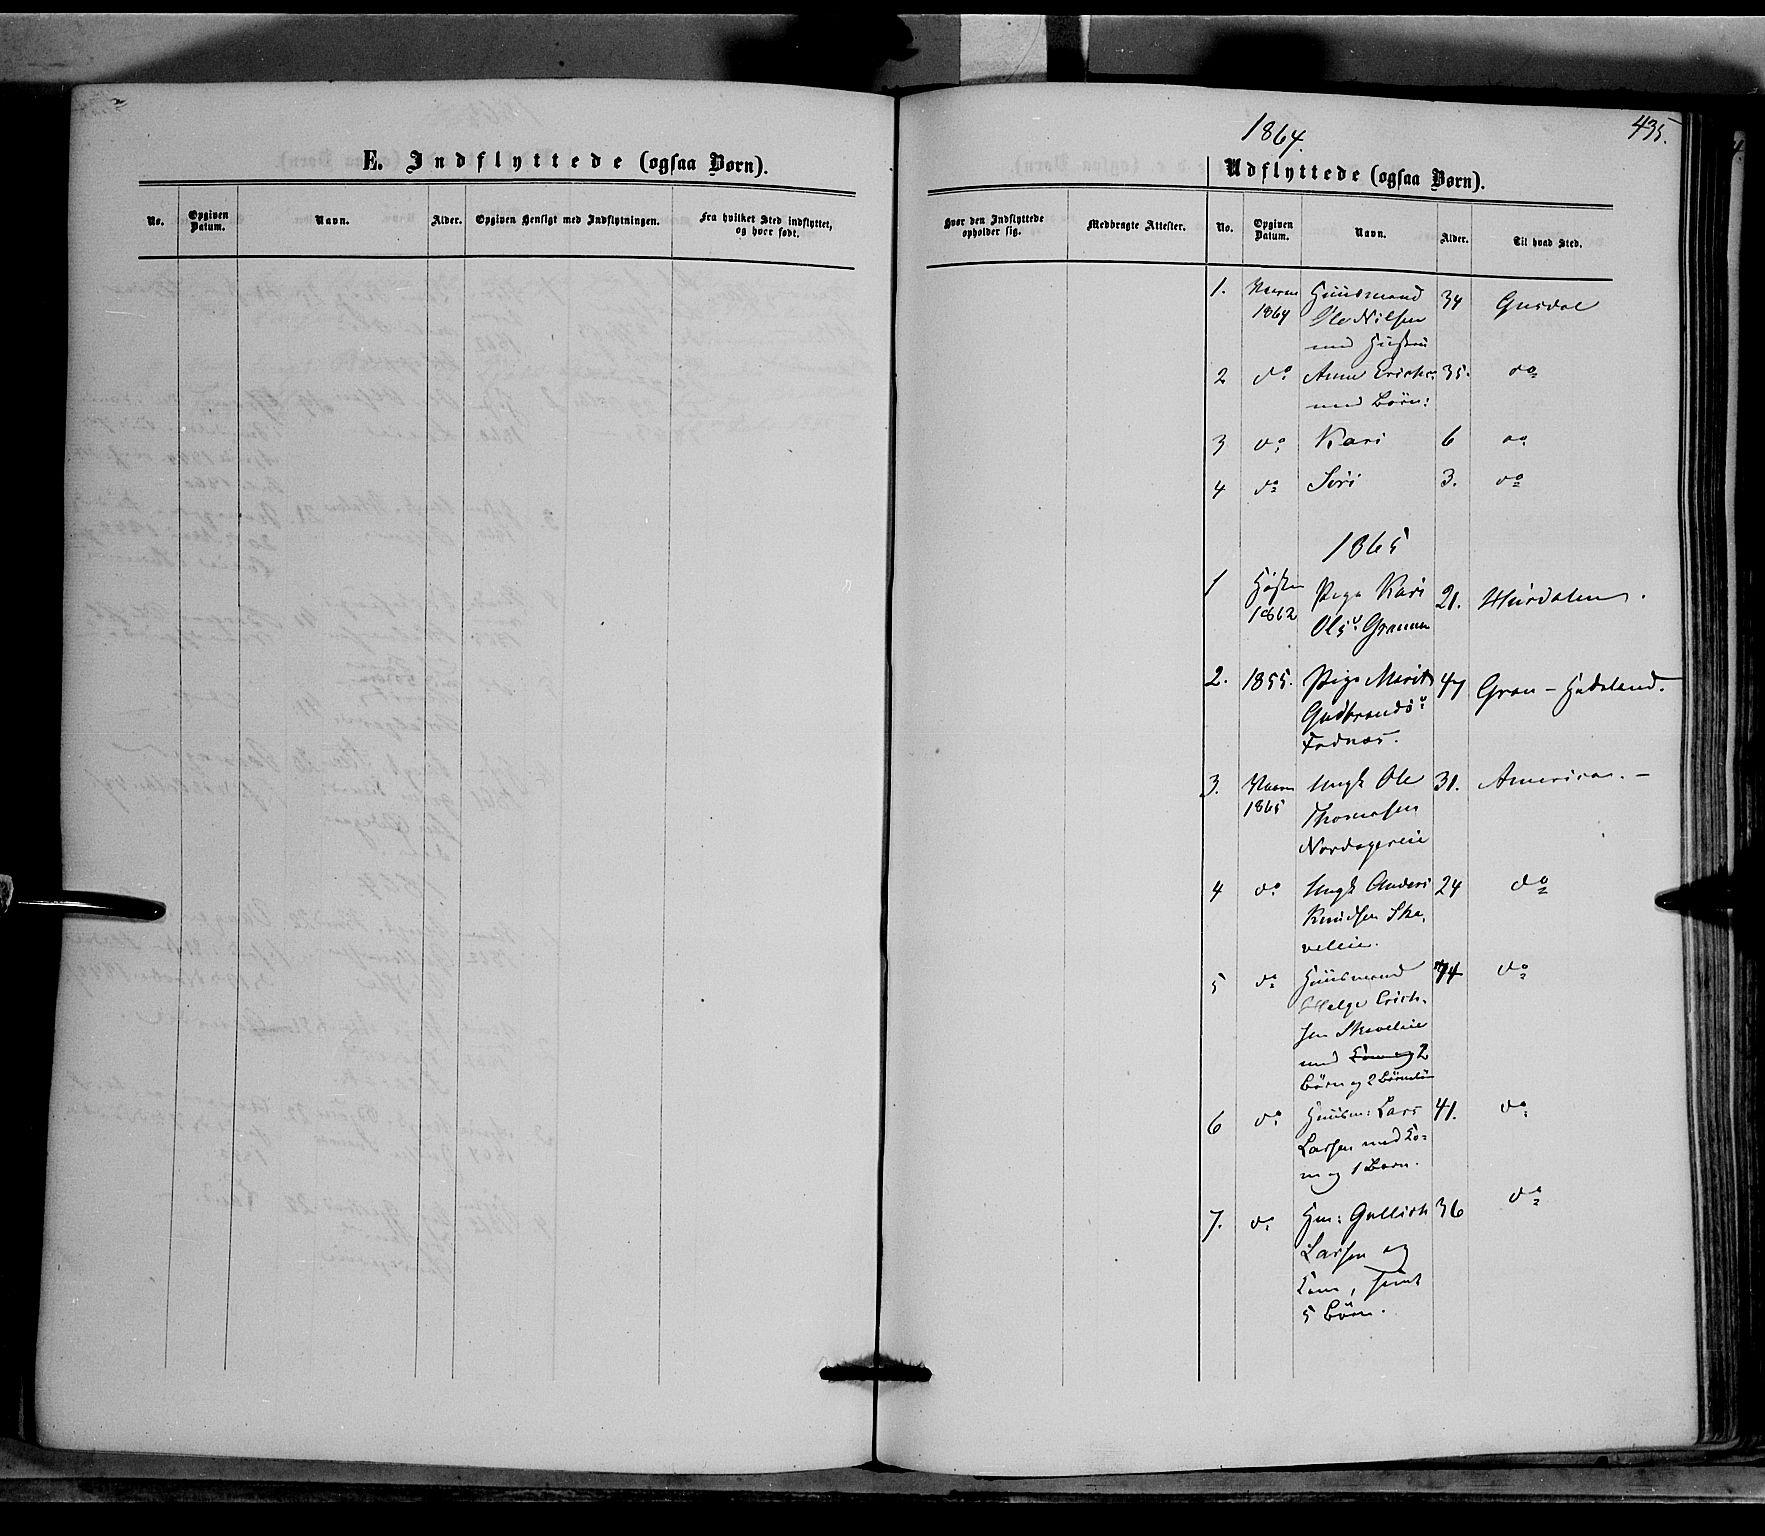 SAH, Nord-Aurdal prestekontor, Ministerialbok nr. 8, 1863-1875, s. 435